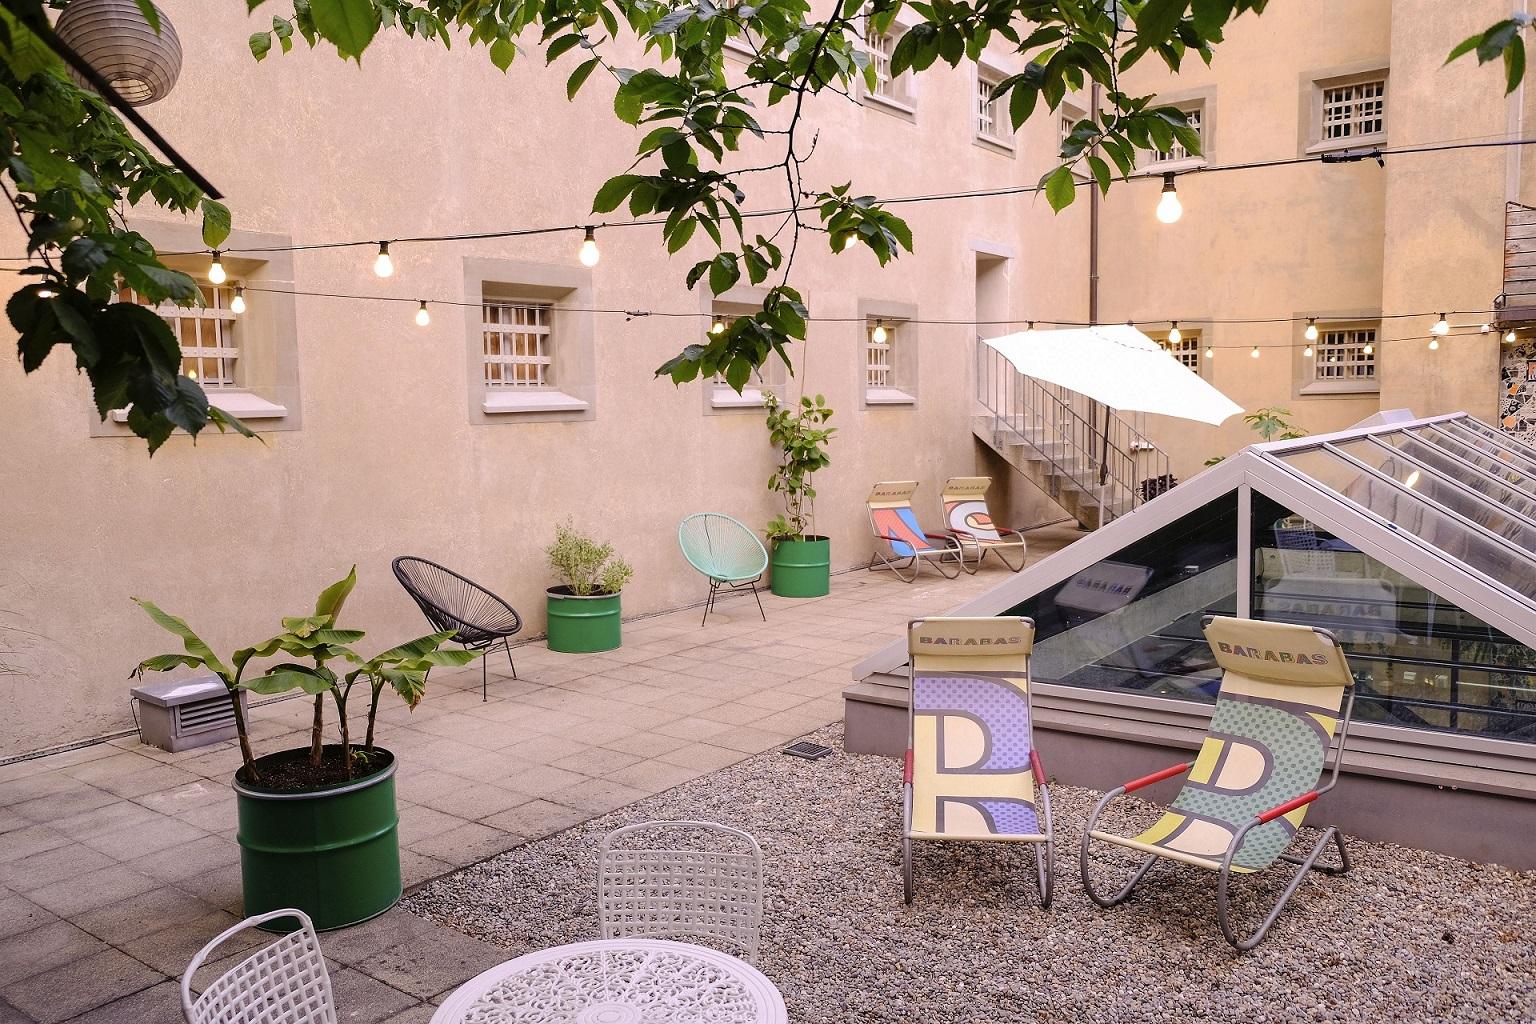 Barabas Hotel Luzern 2